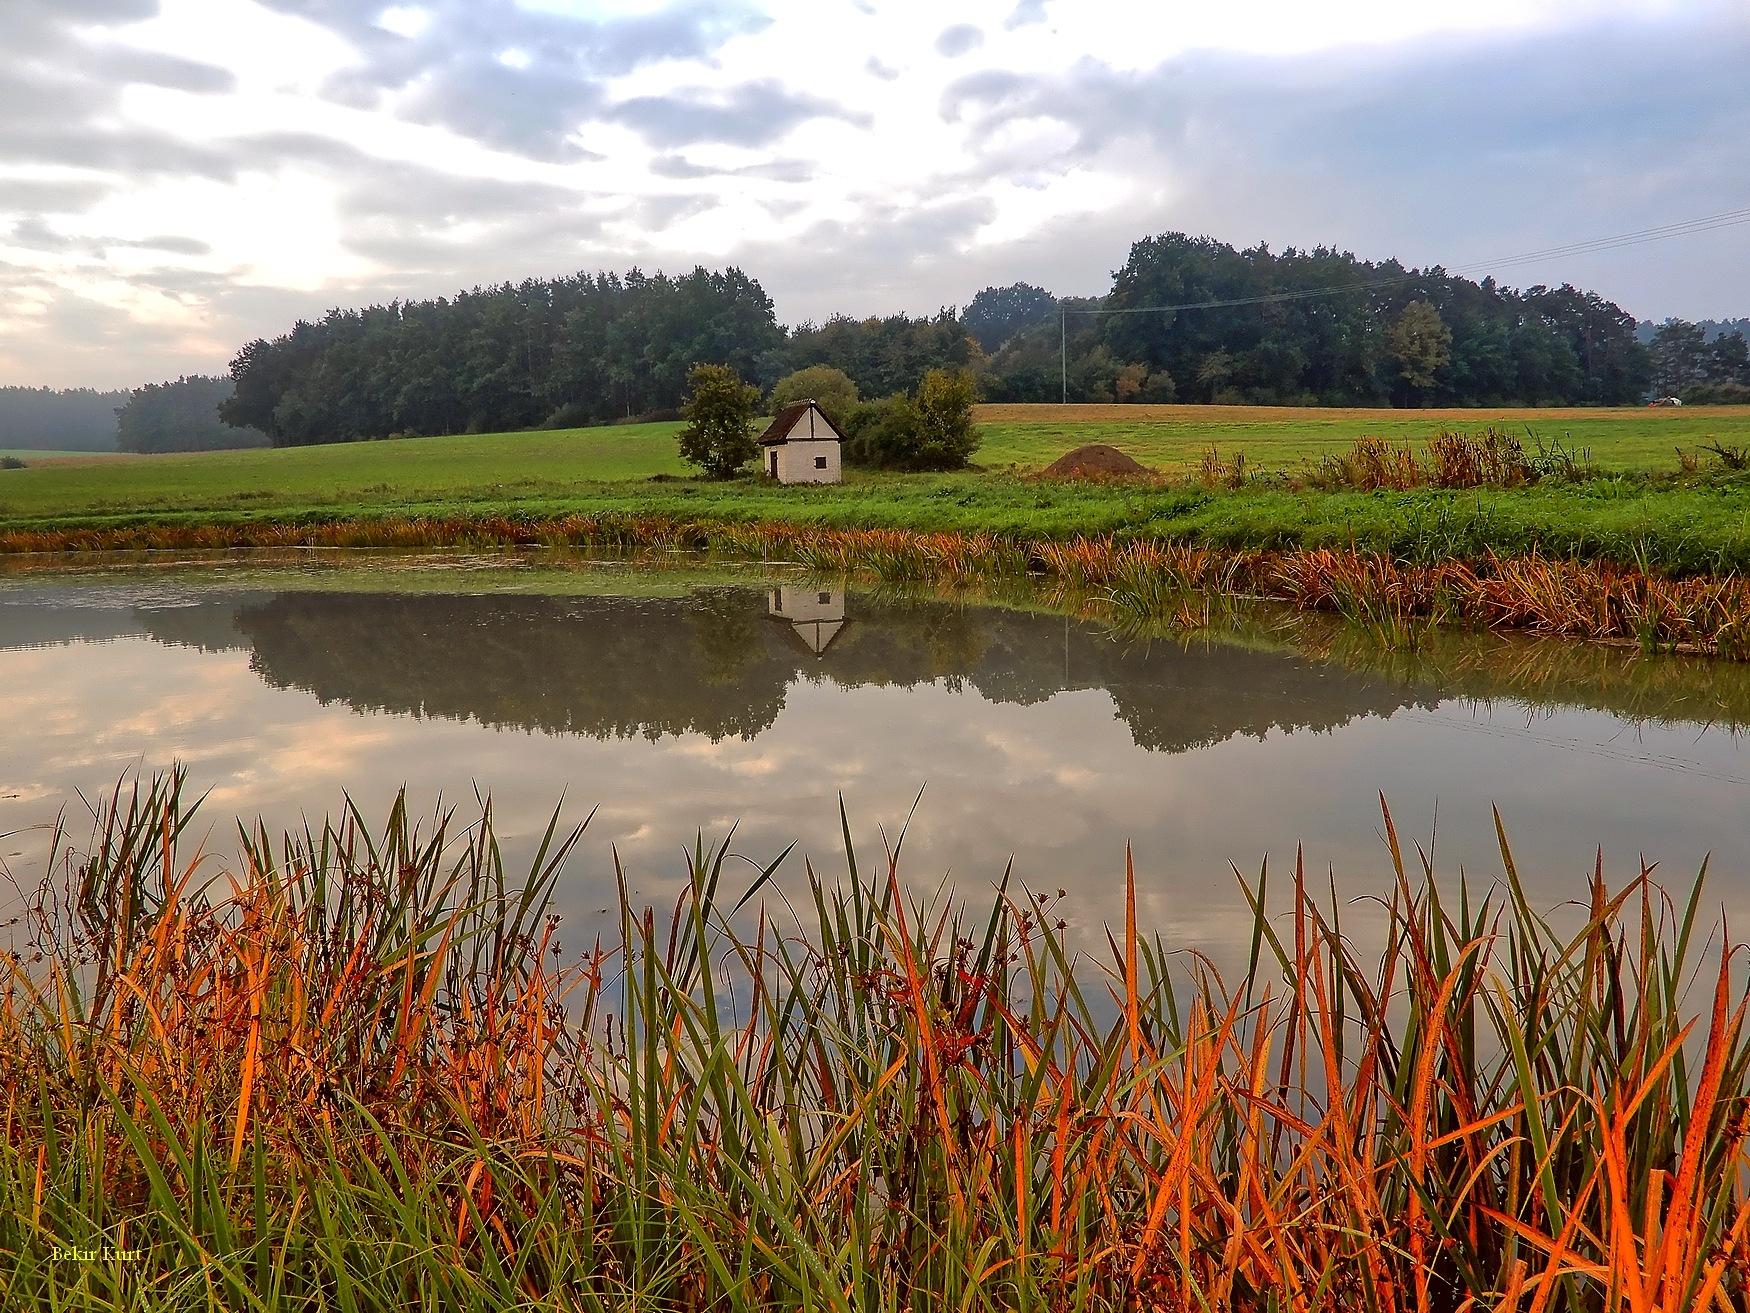 Pond Reflections (4) by Bekir Kurt